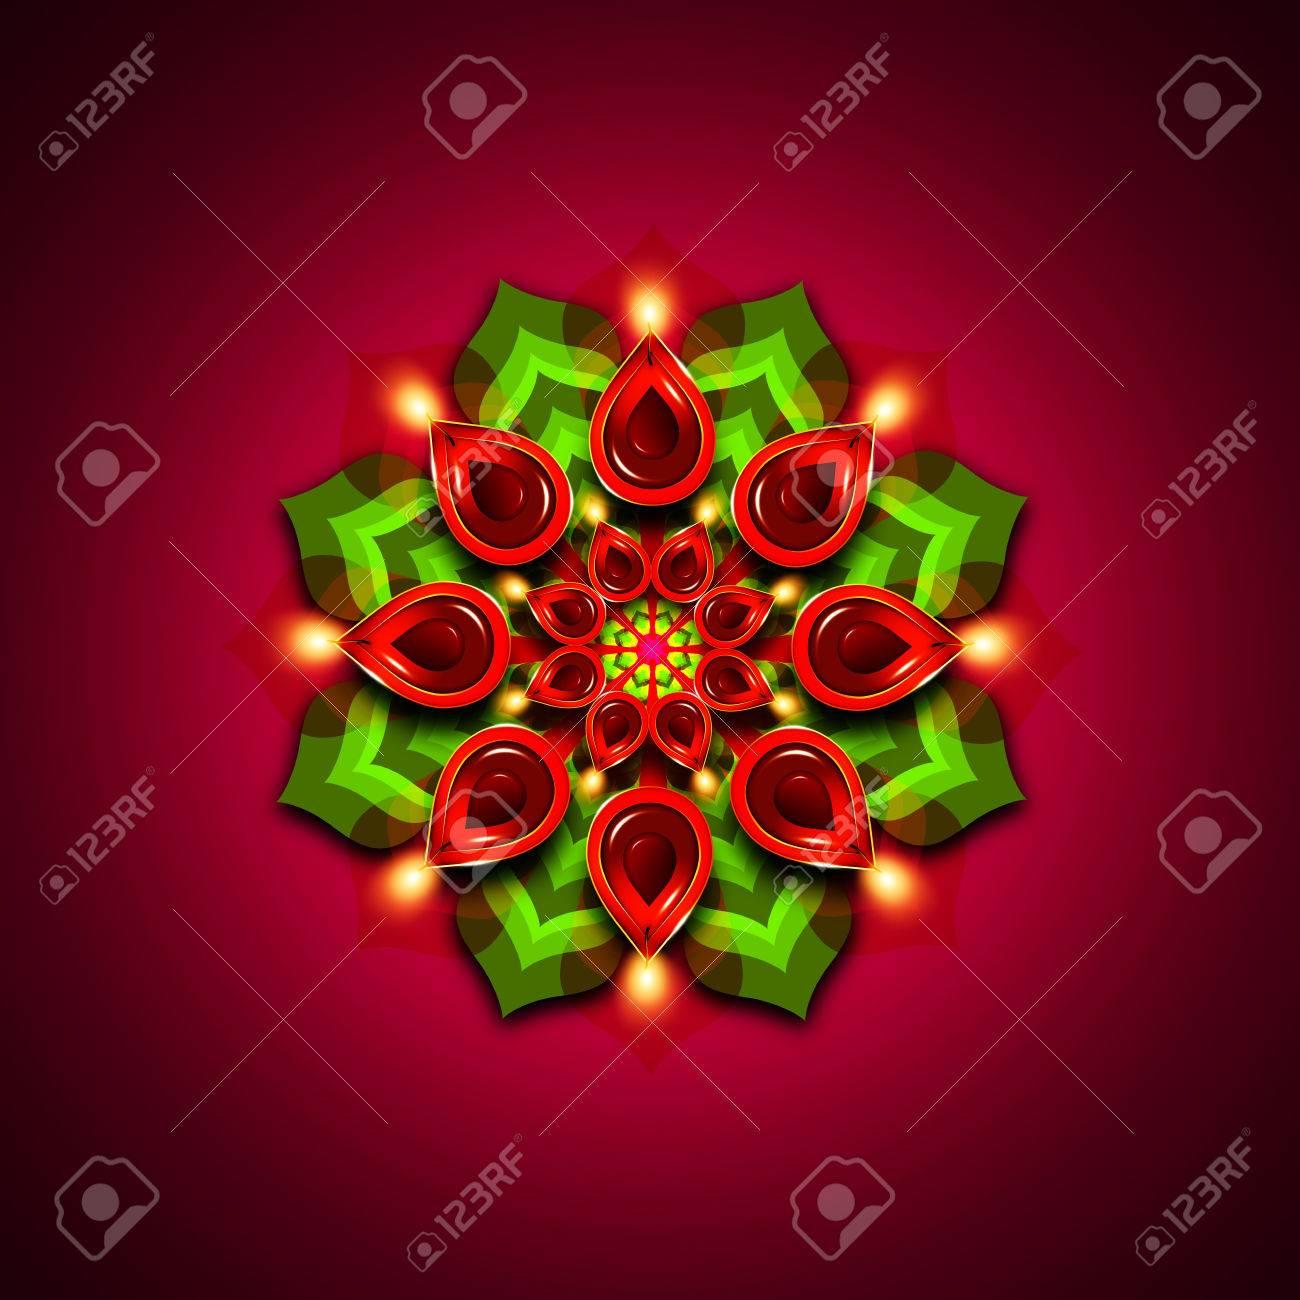 Rangoli With Diwali Diya Elements Over Dark Rouge Background Stock 1300x1300